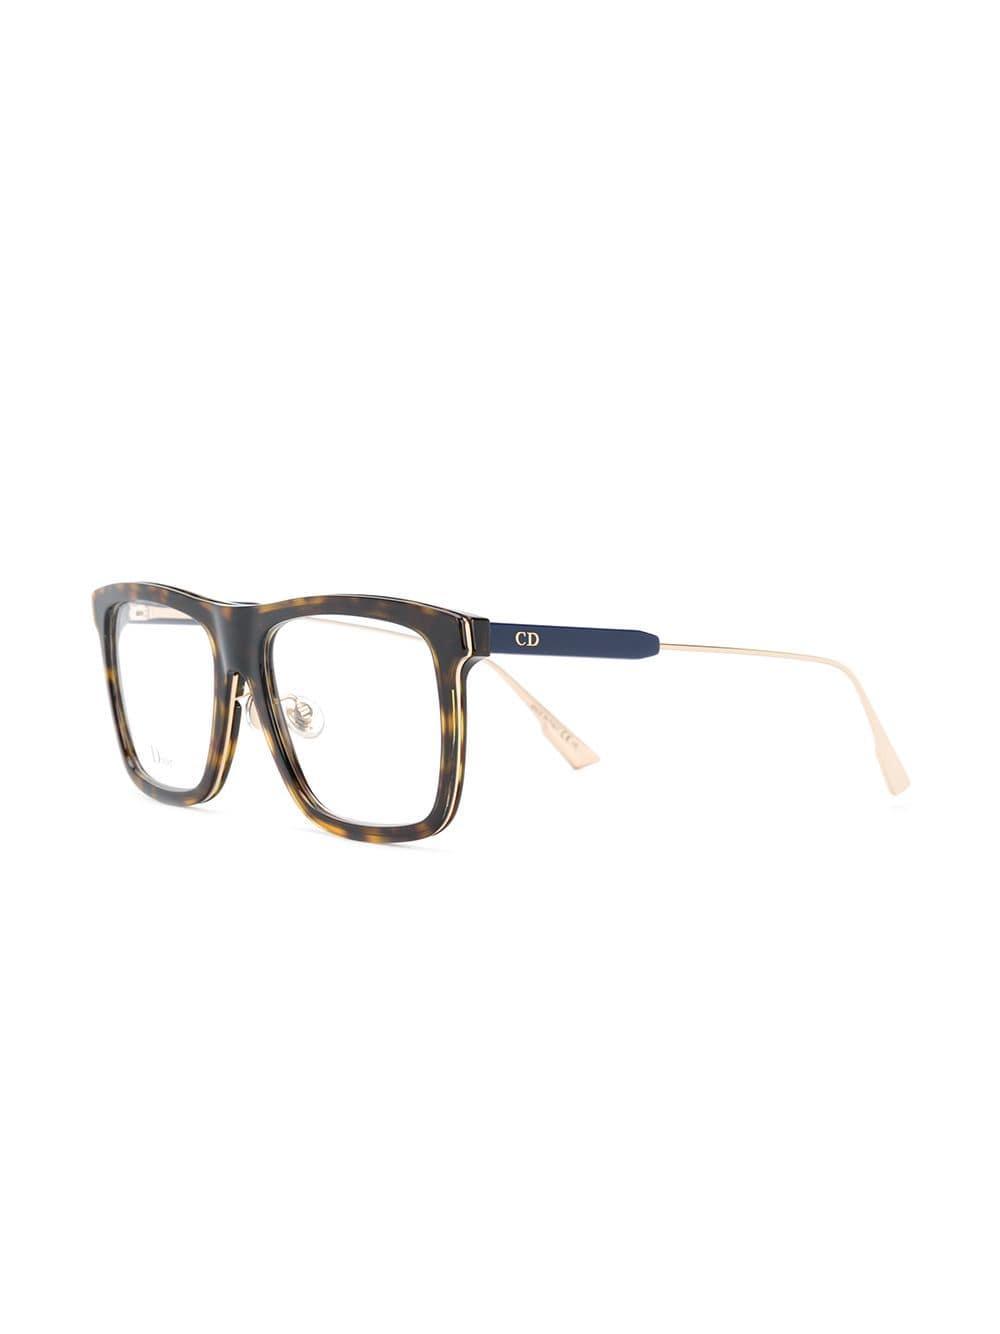 e3bb2ec0fb9 Lyst - Dior My Dior 1 Glasses in Brown